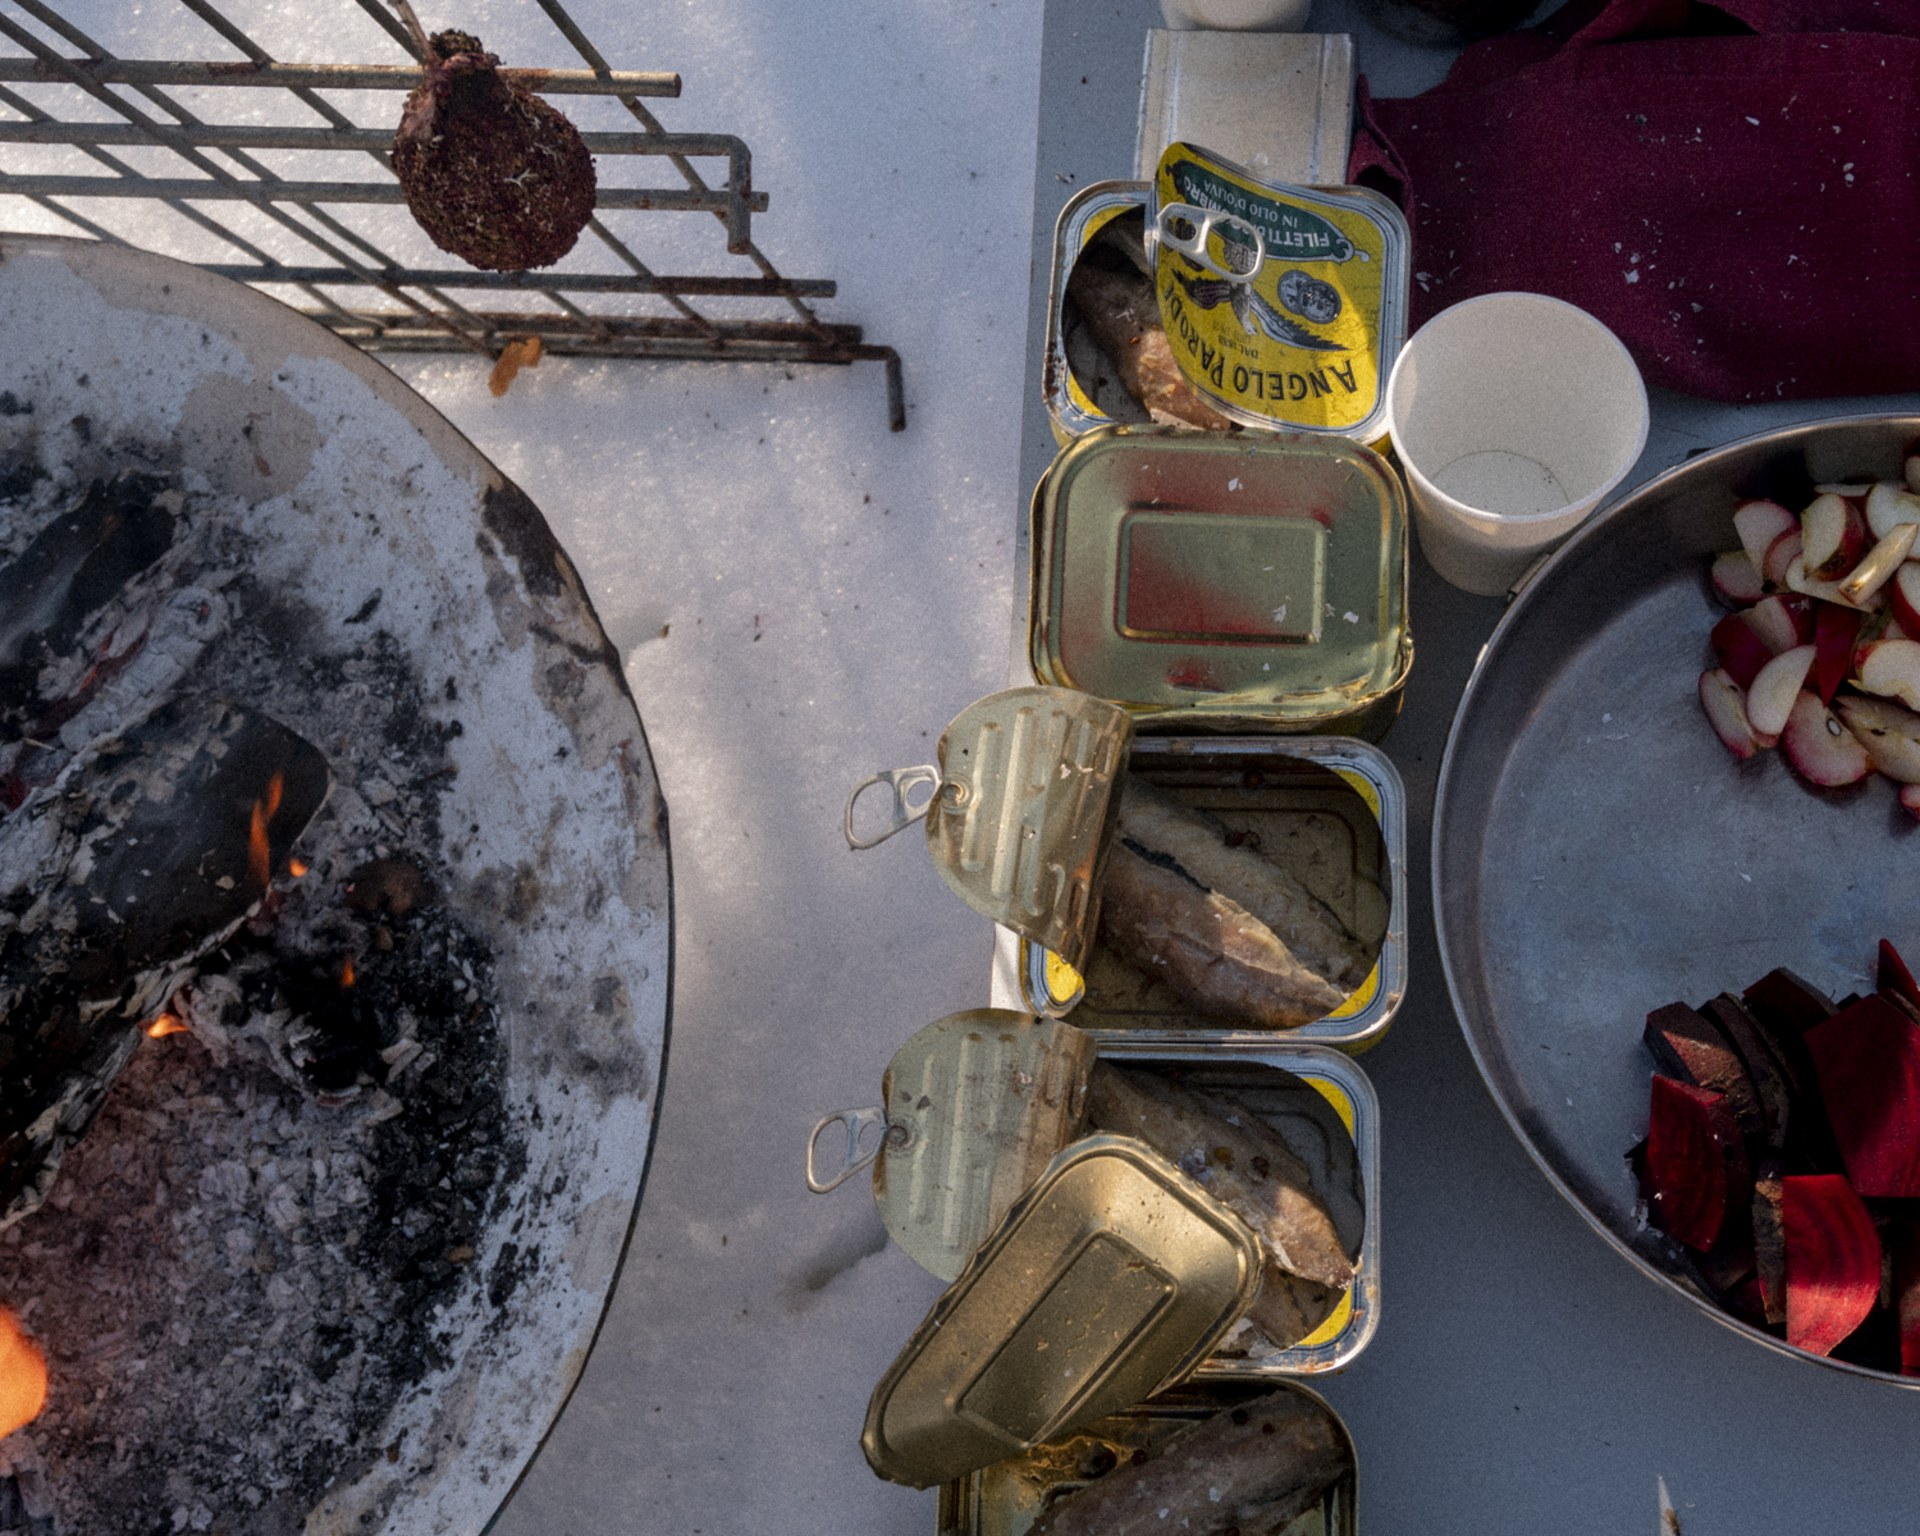 Mackerel - Smoked mackerel with green juniper, scots pine bark and dehydrated blackthorns